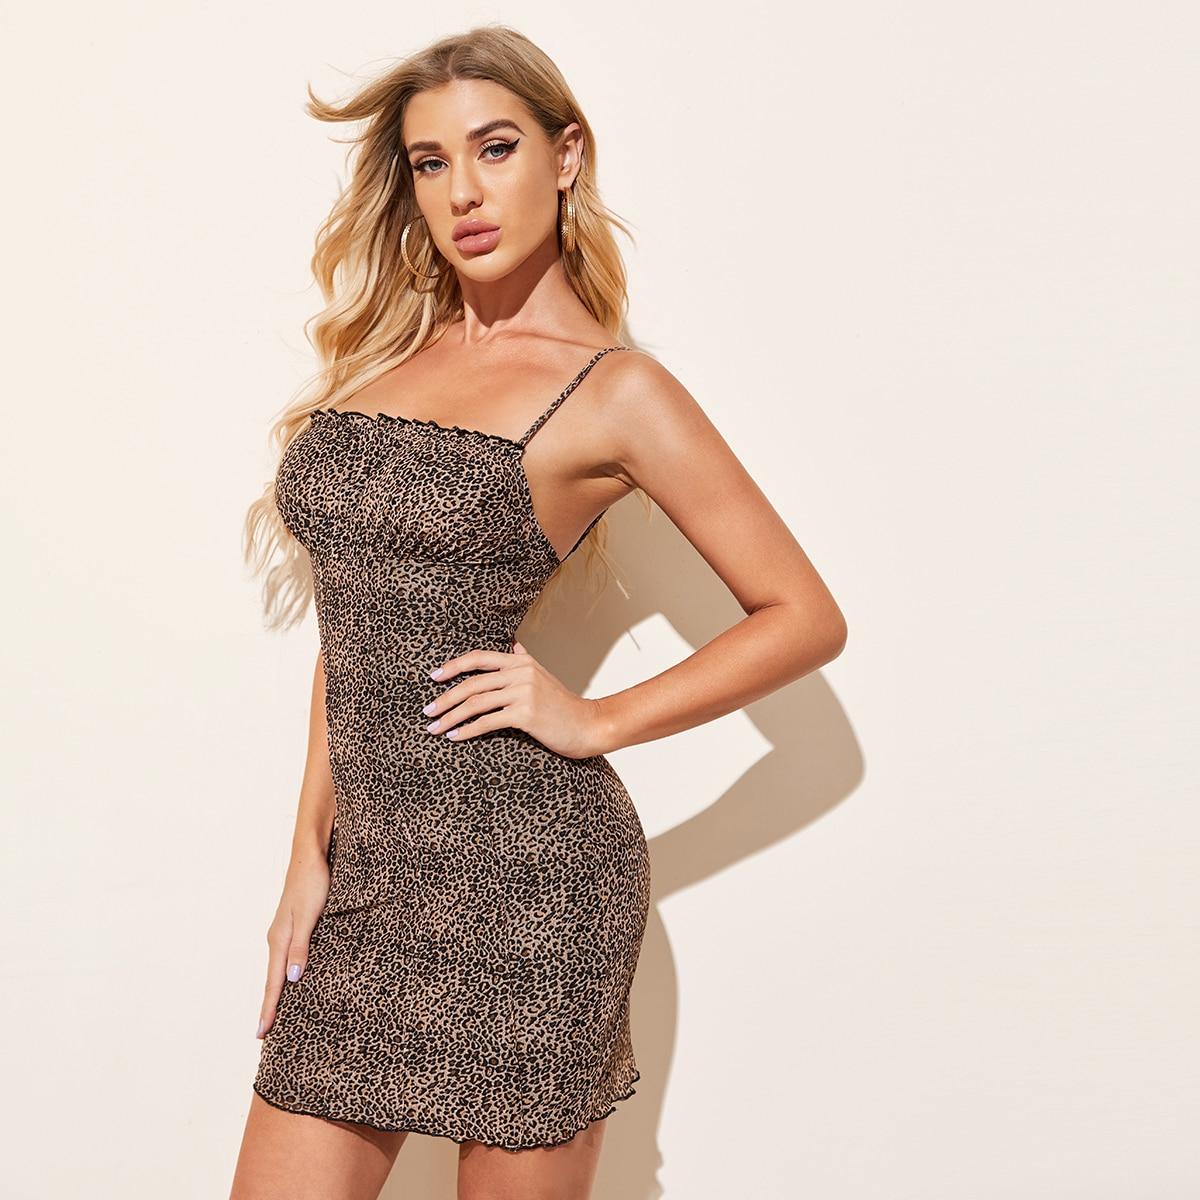 SHEIN / Frill Trim Seam Front Leopard Mesh Dress